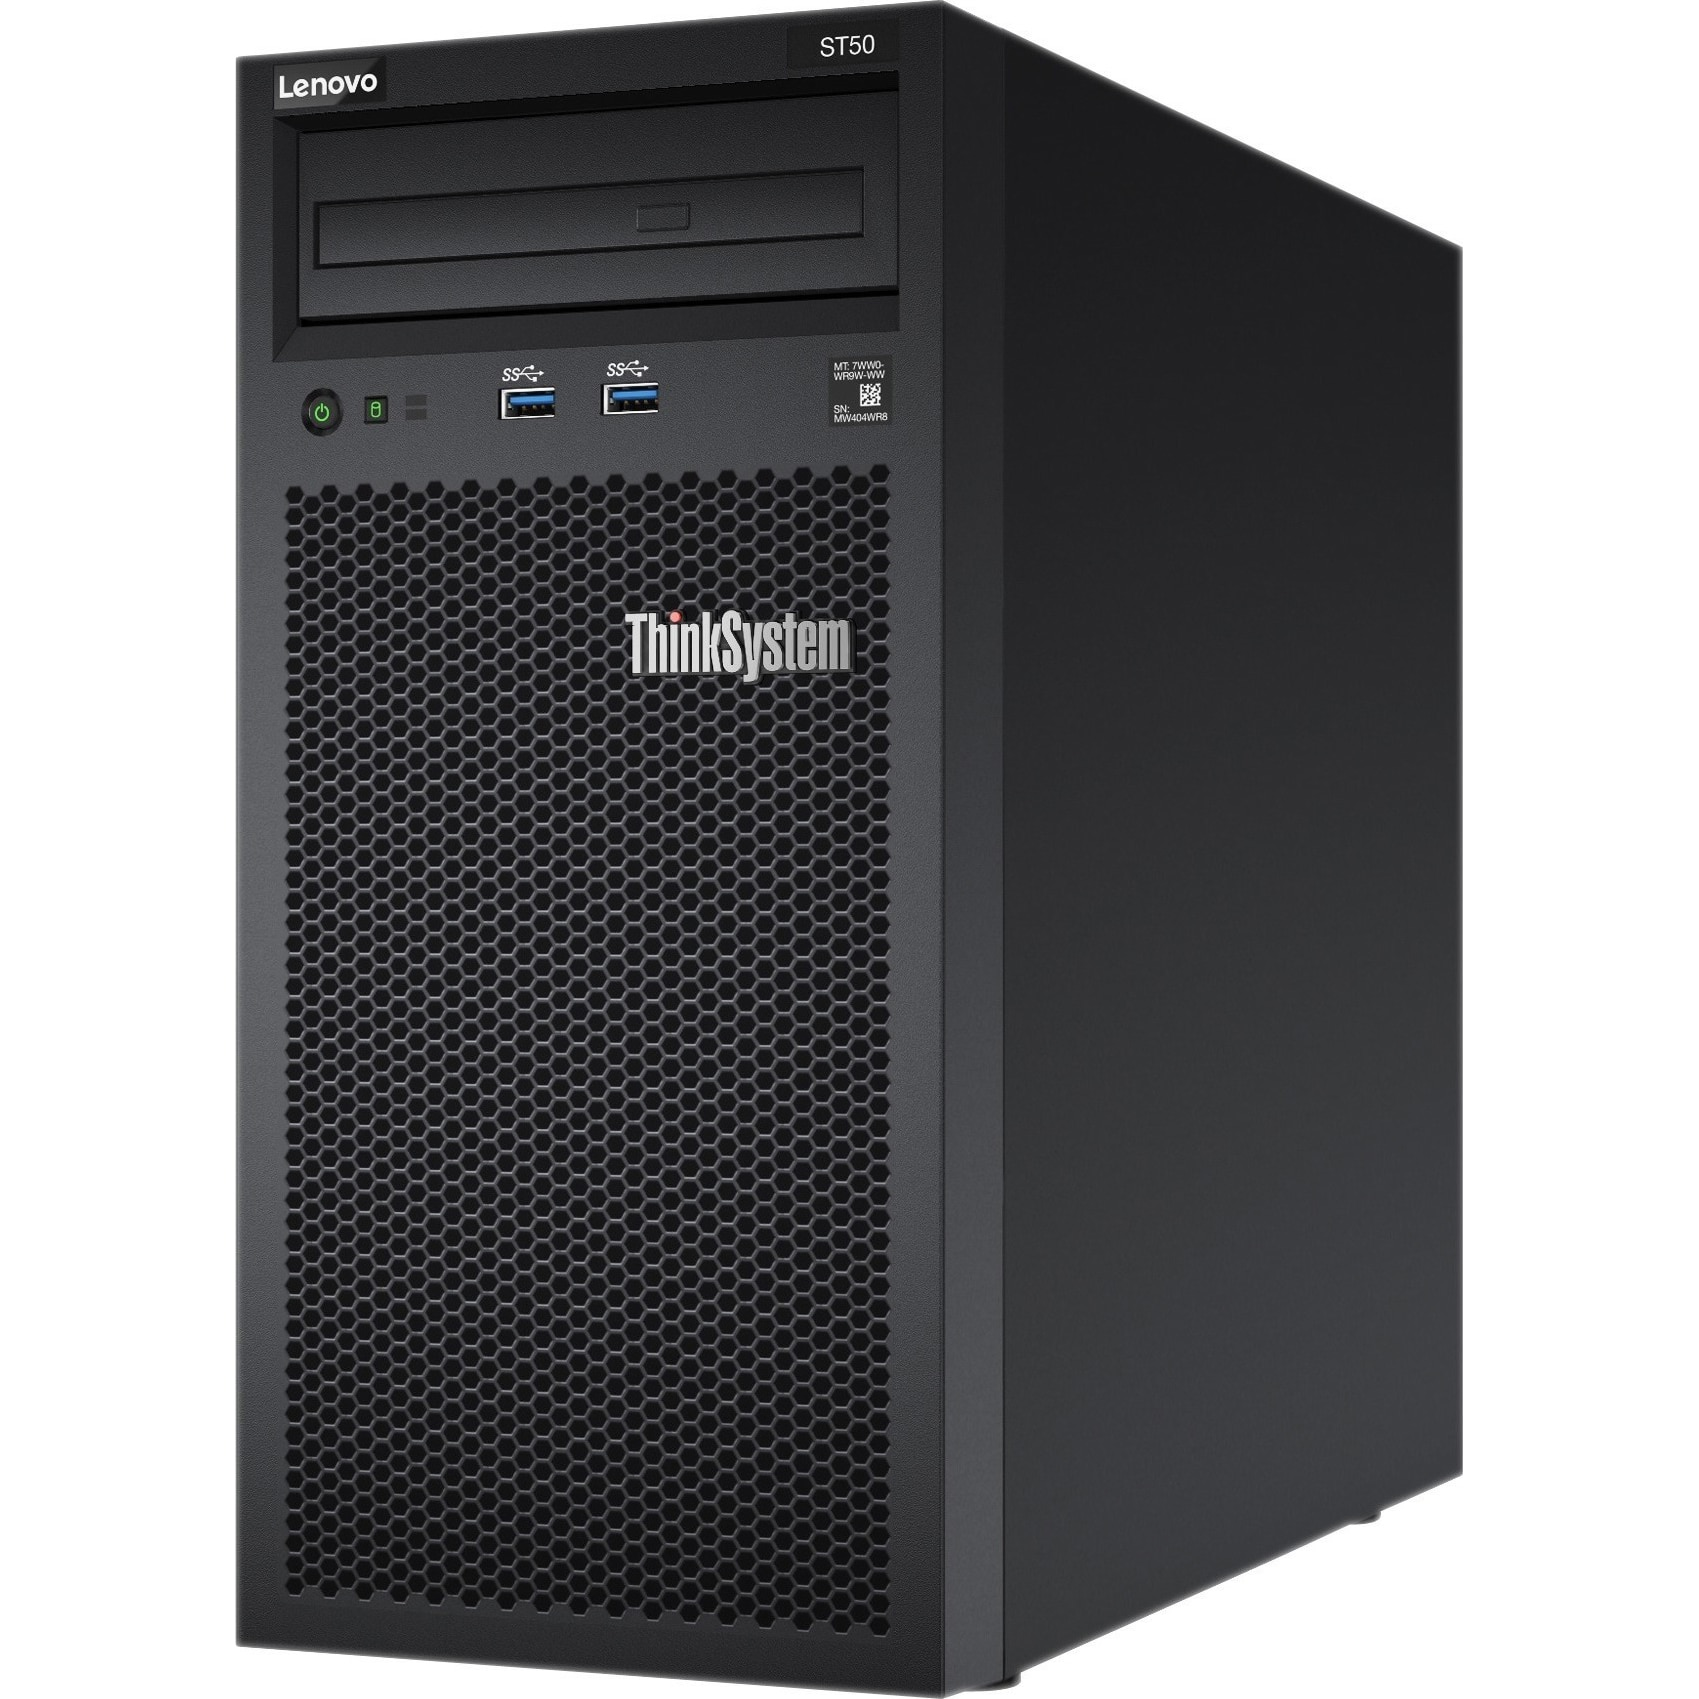 Fotografie Sistem Server Lenovo ST50 Xeon E-2144G (4C 3.6GHz 8MB Cache/71W), 8GB RAM, 2x1TB SATA HDD, DVD RW, Gigabit Ethernet- Integrated 1 port Power Supply 250W